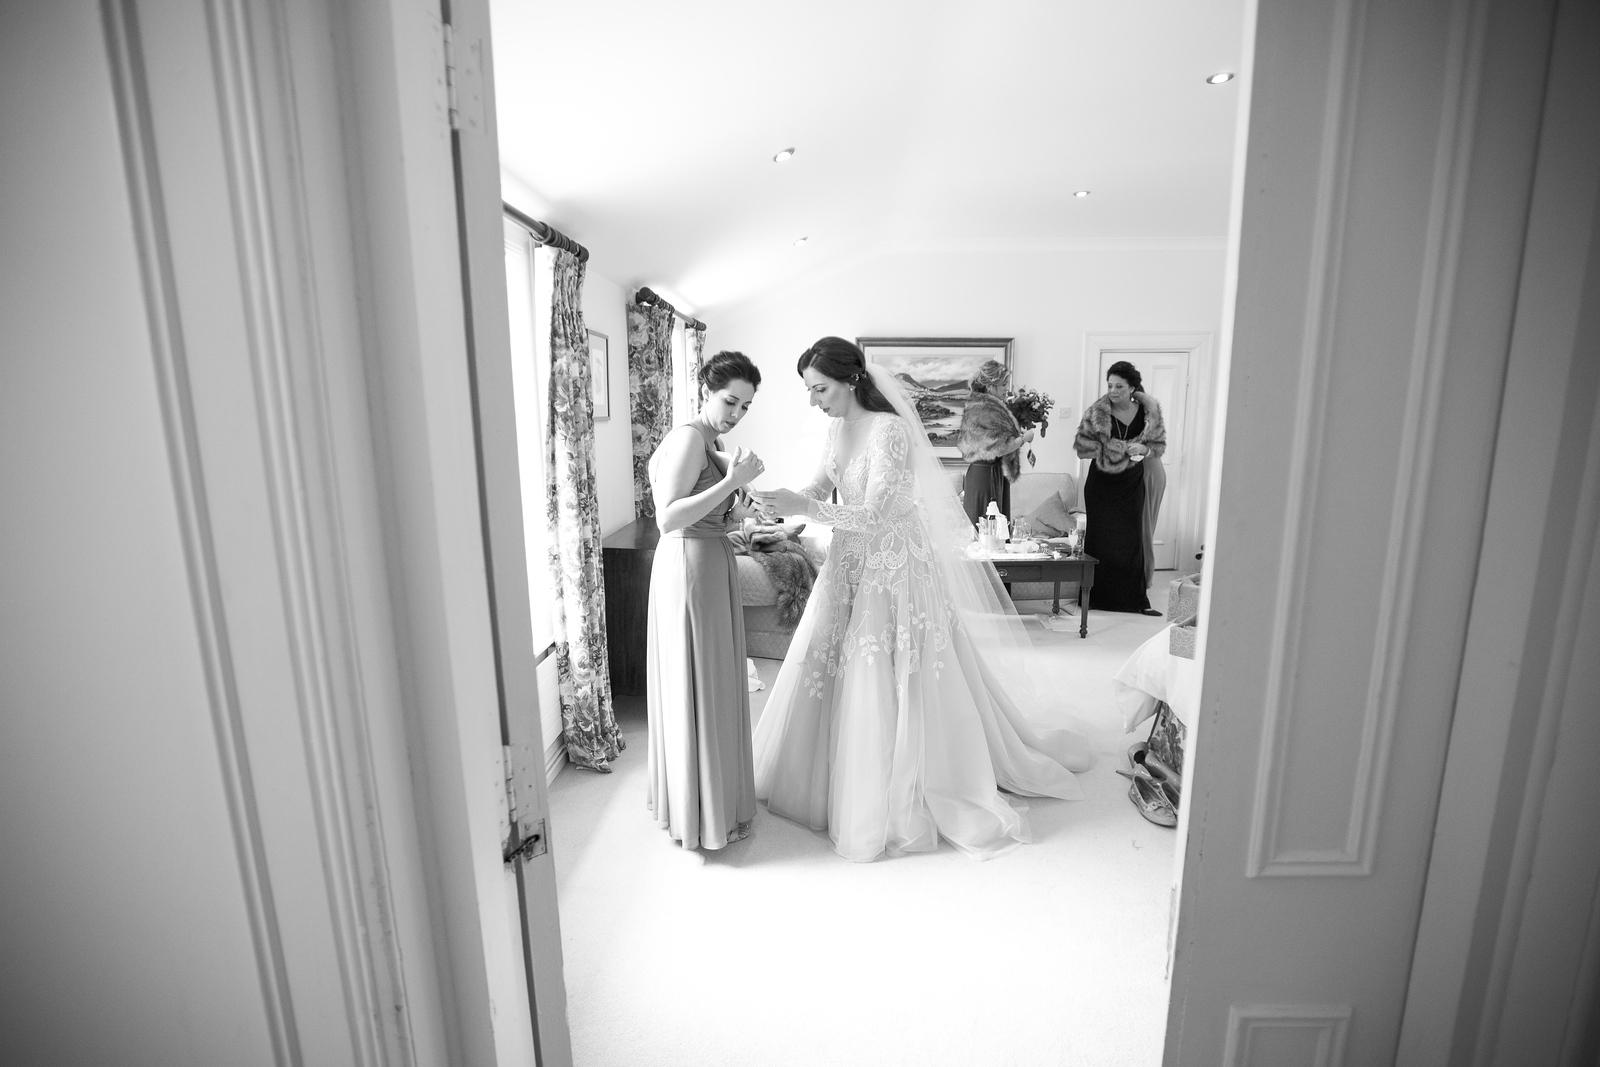 Aisha & Randy's Wedding at Delphi Lodge on 3/15/17